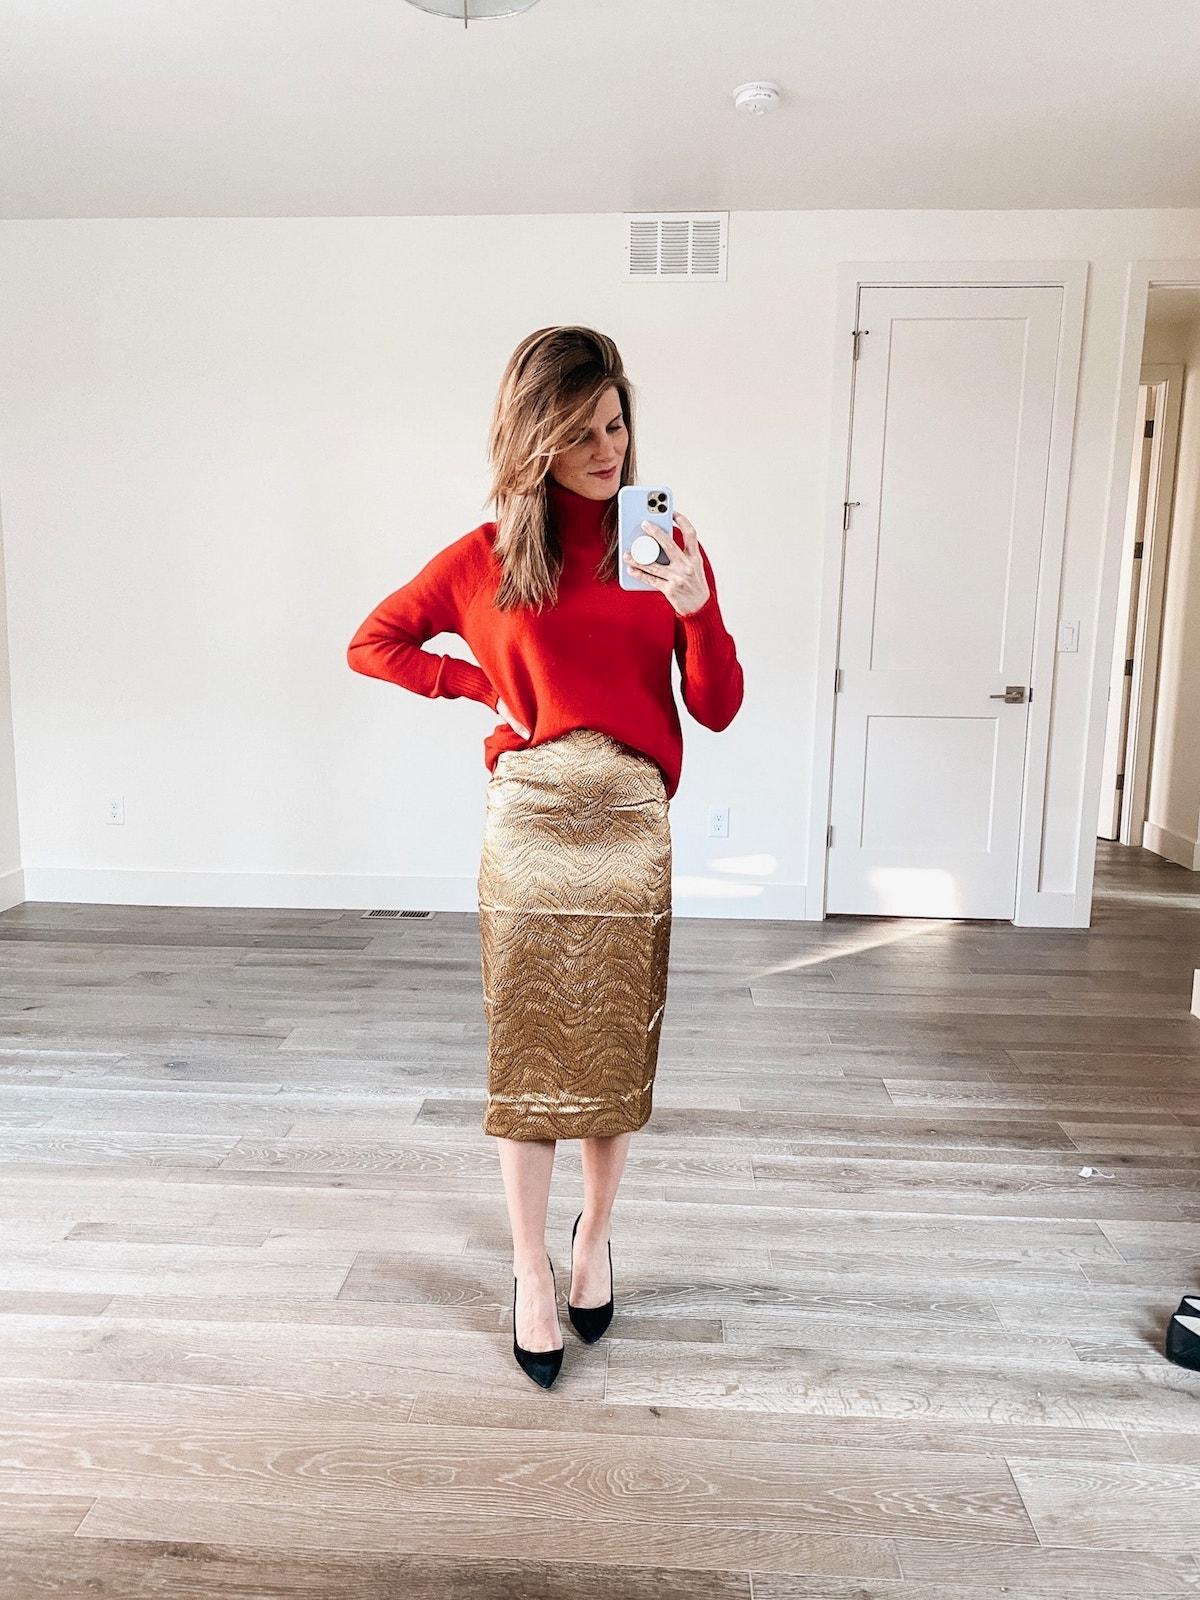 Brighton Keller wearing red sweater and JCrew gold skirt